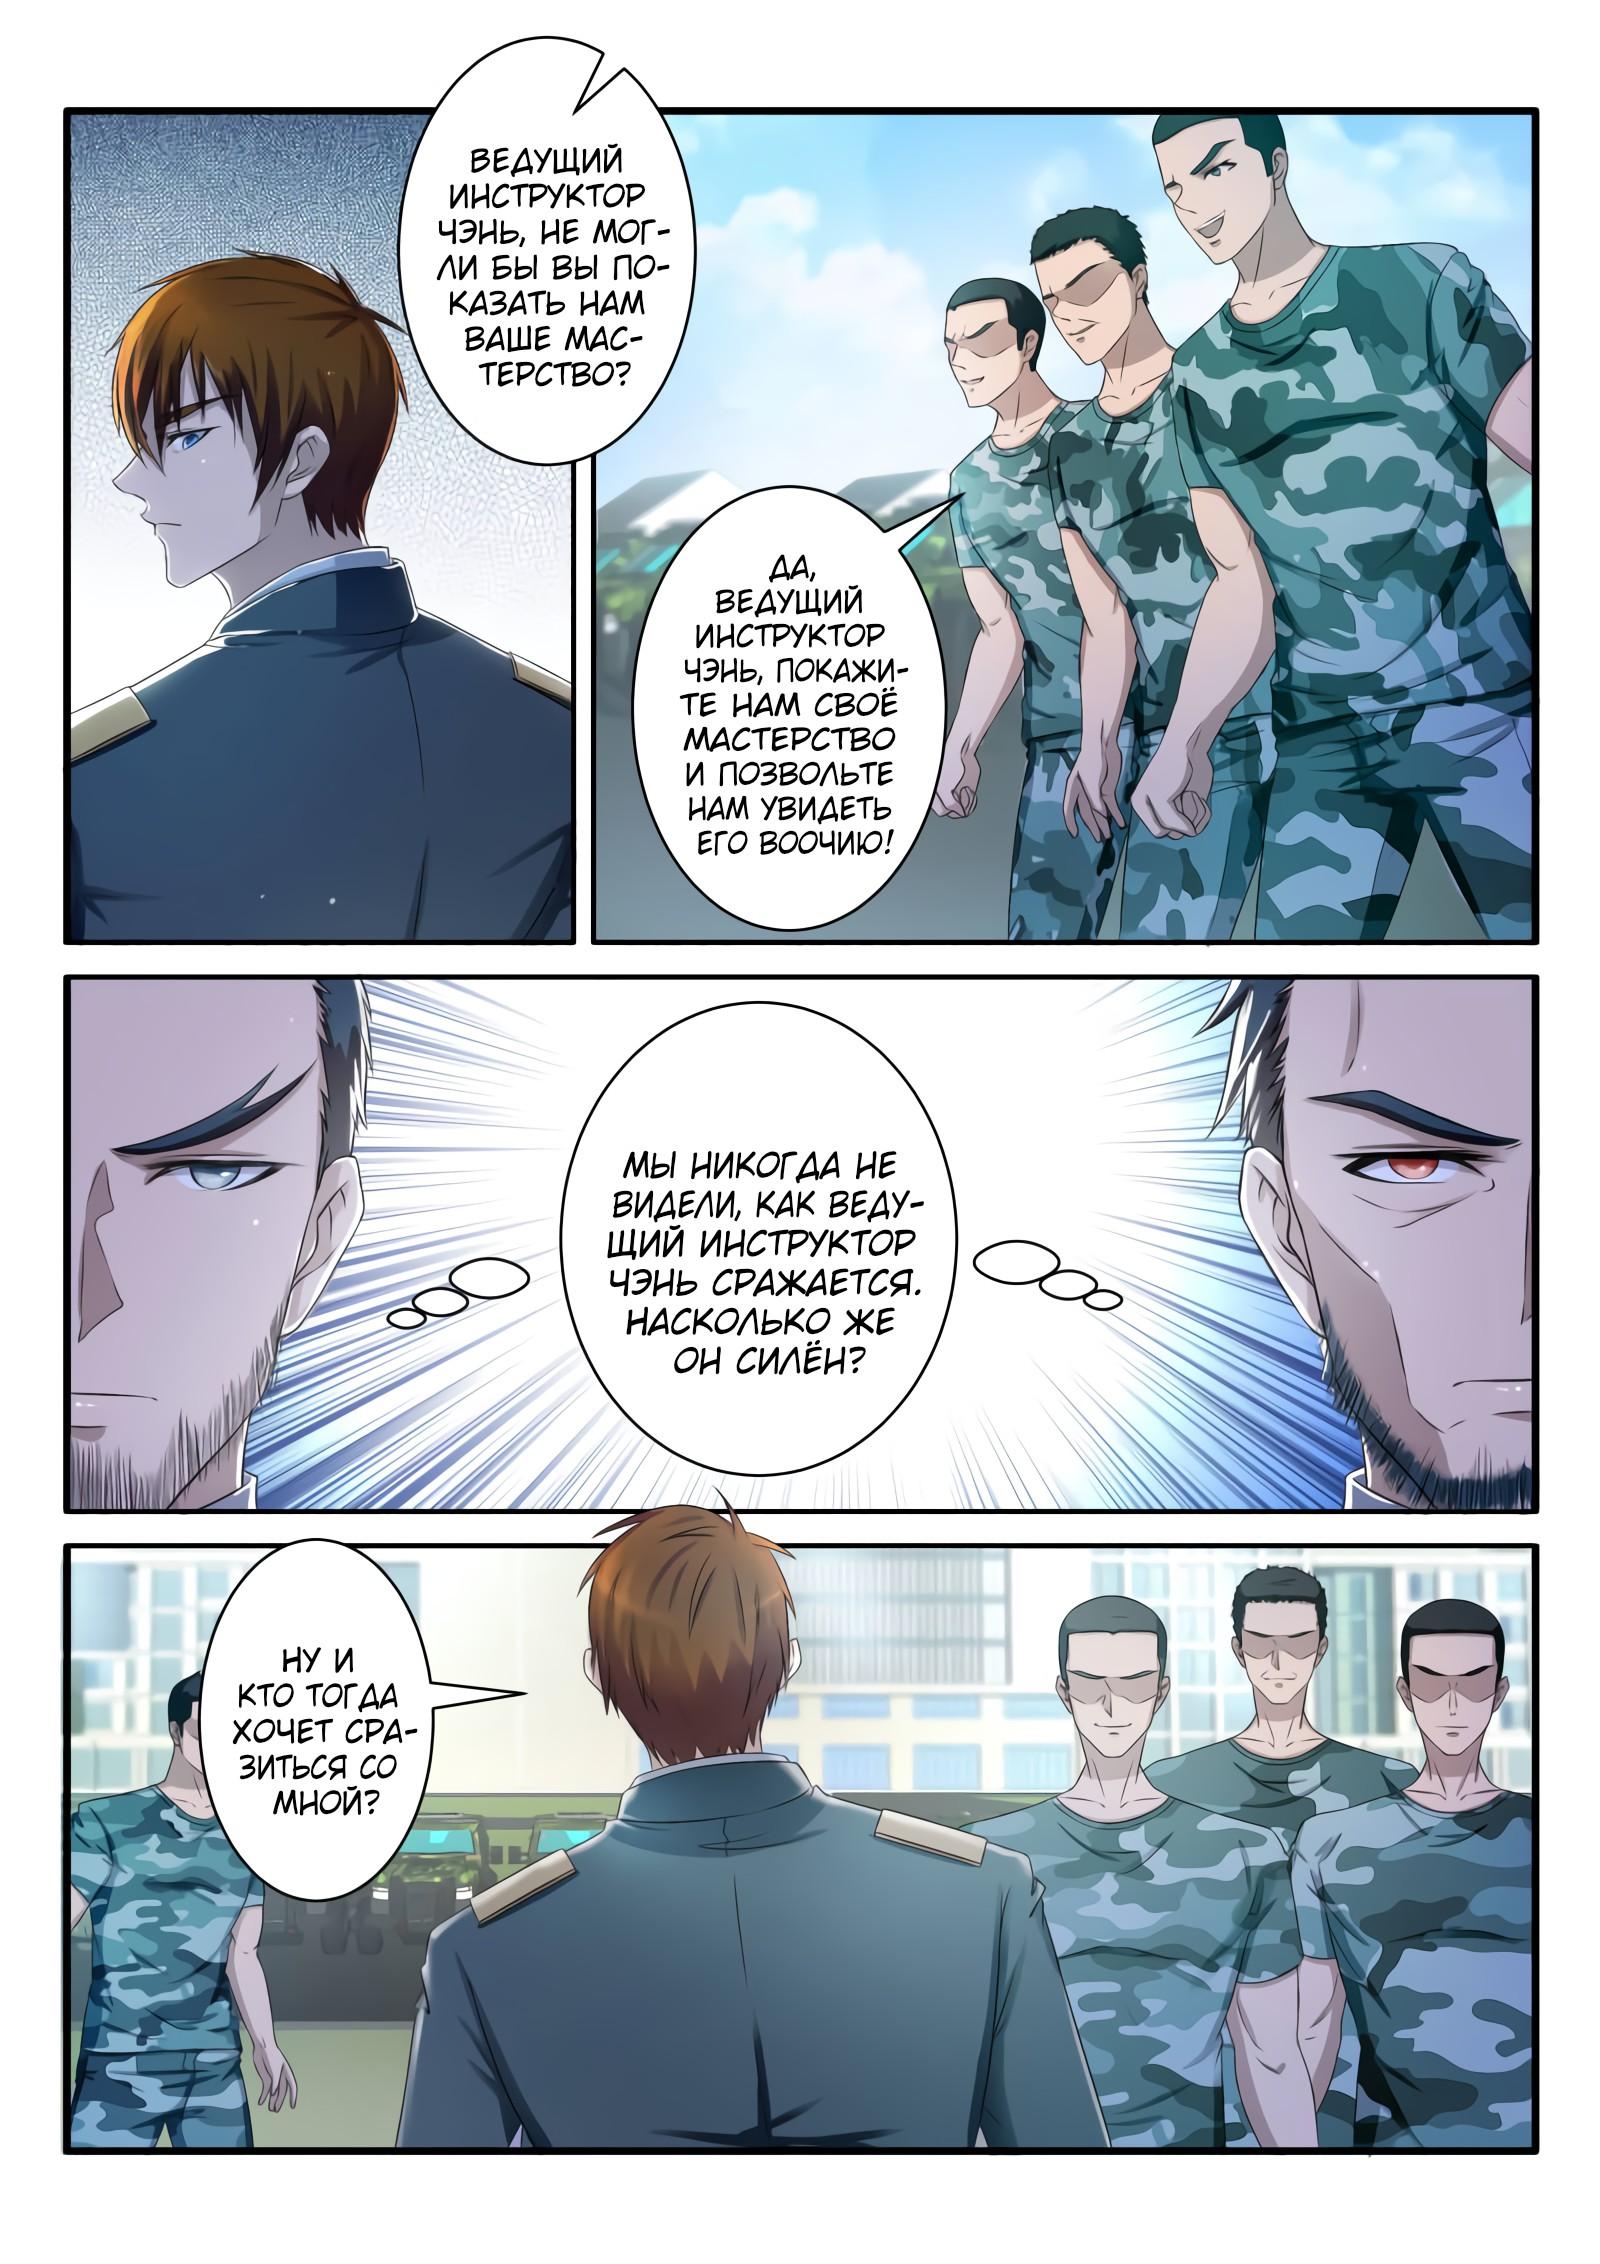 https://r2.ninemanga.com/comics/pic5/40/37032/1464883/1564141848876.jpg Page 2